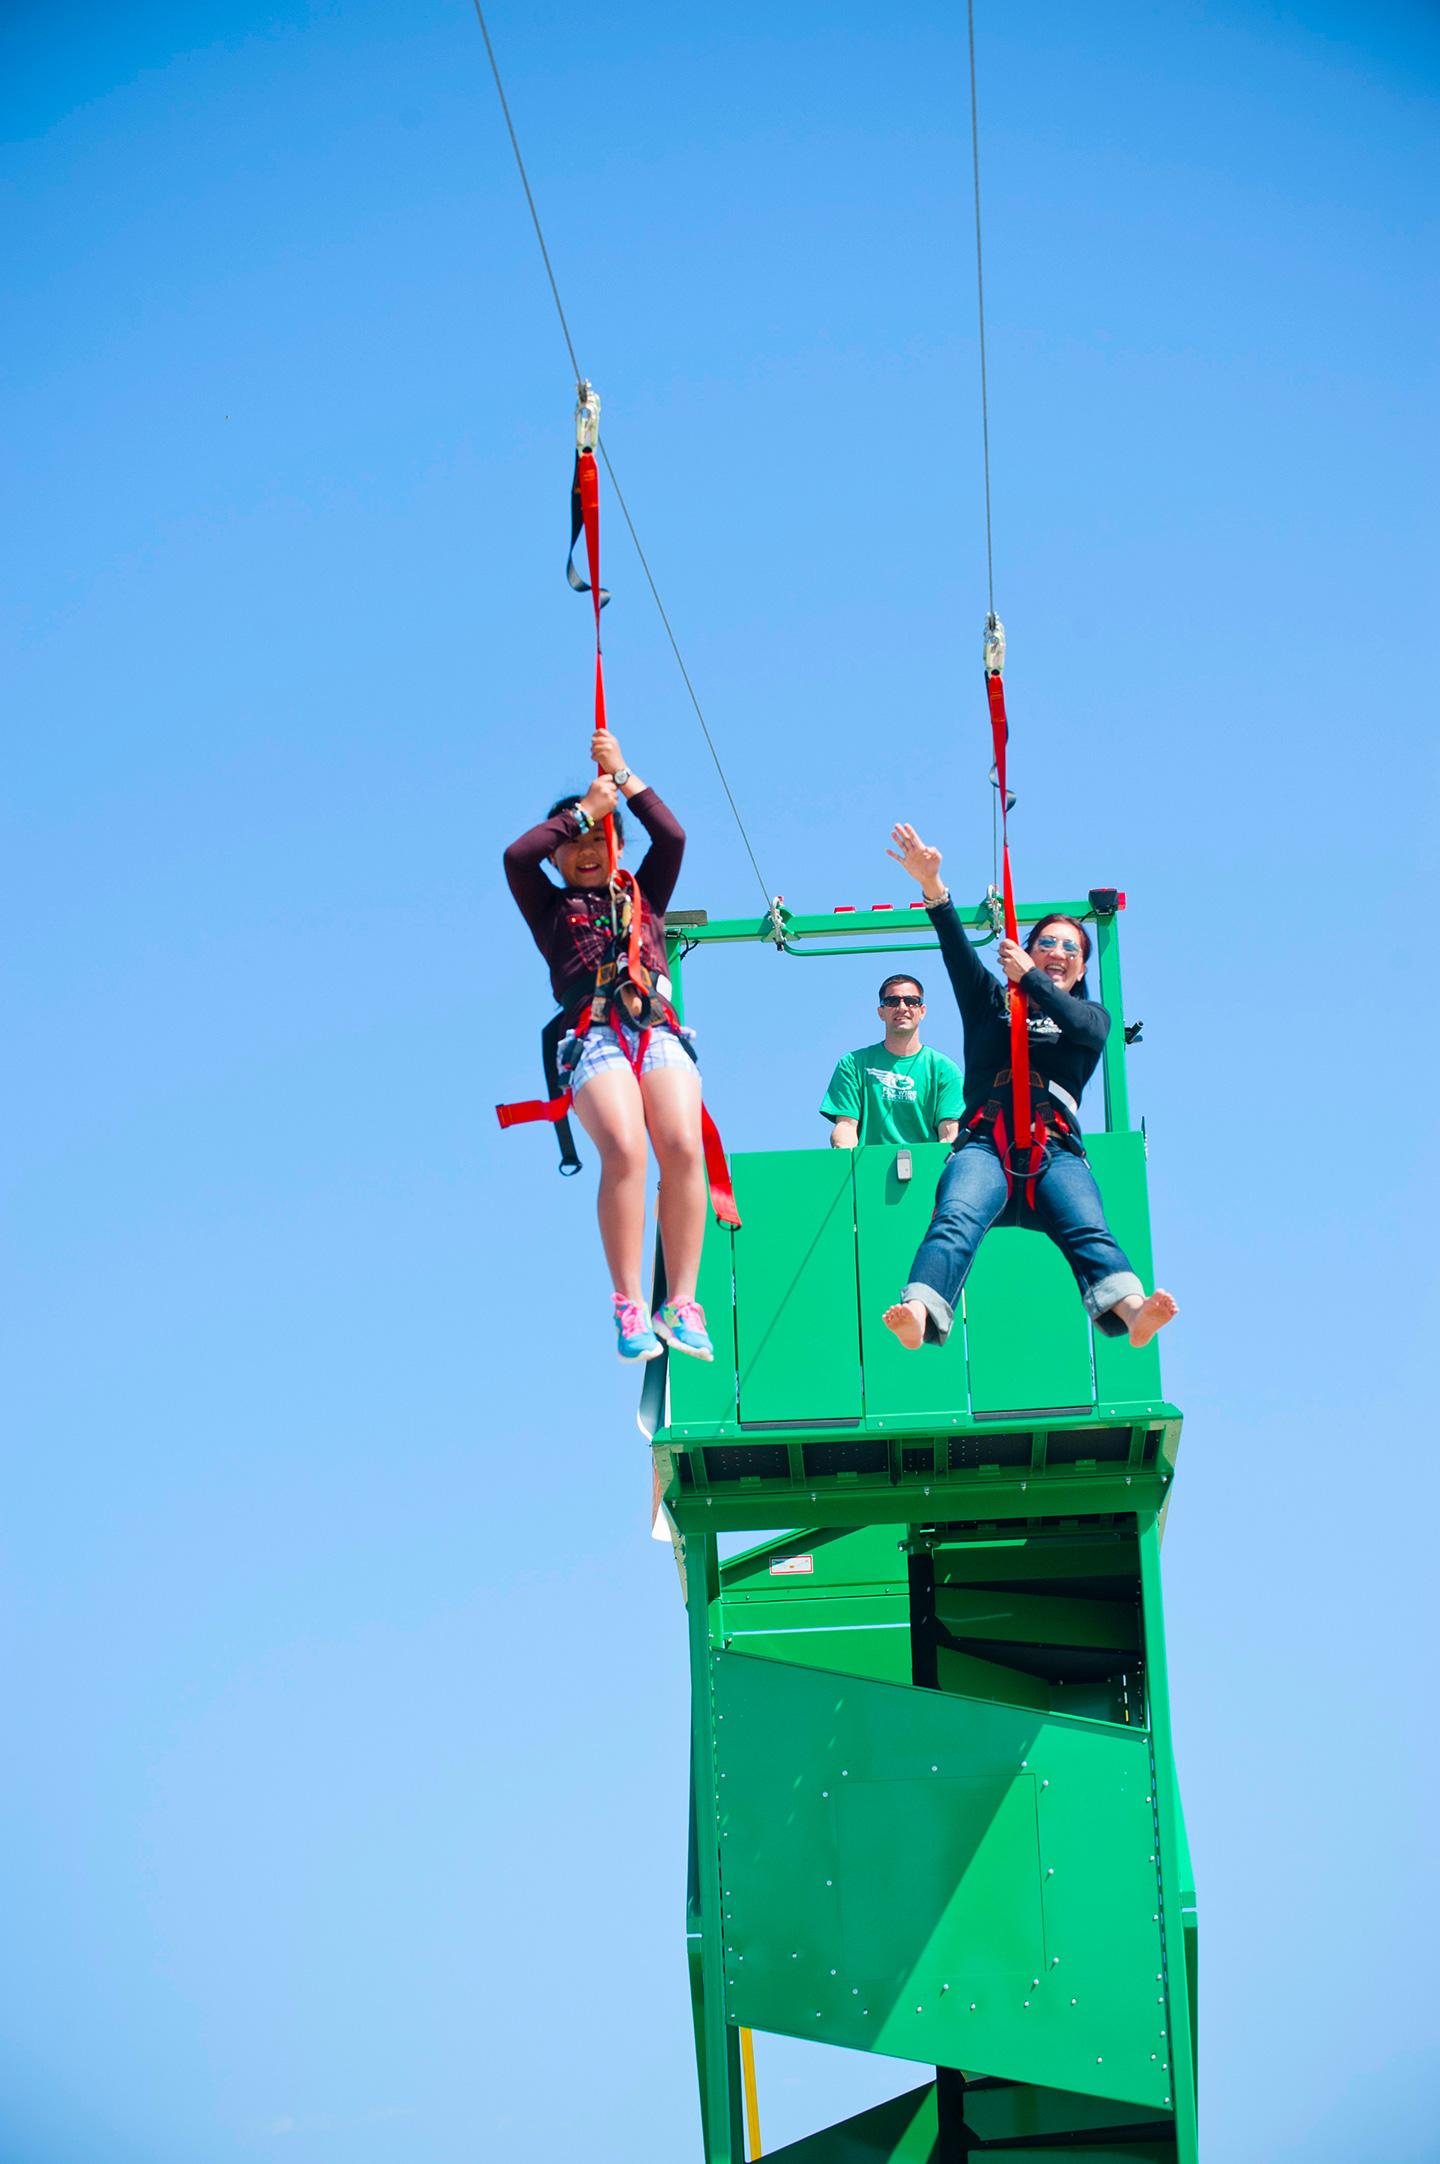 Zipline-Extreme-Engineering-Fly-Wire-Zipline - Extreme Engineering